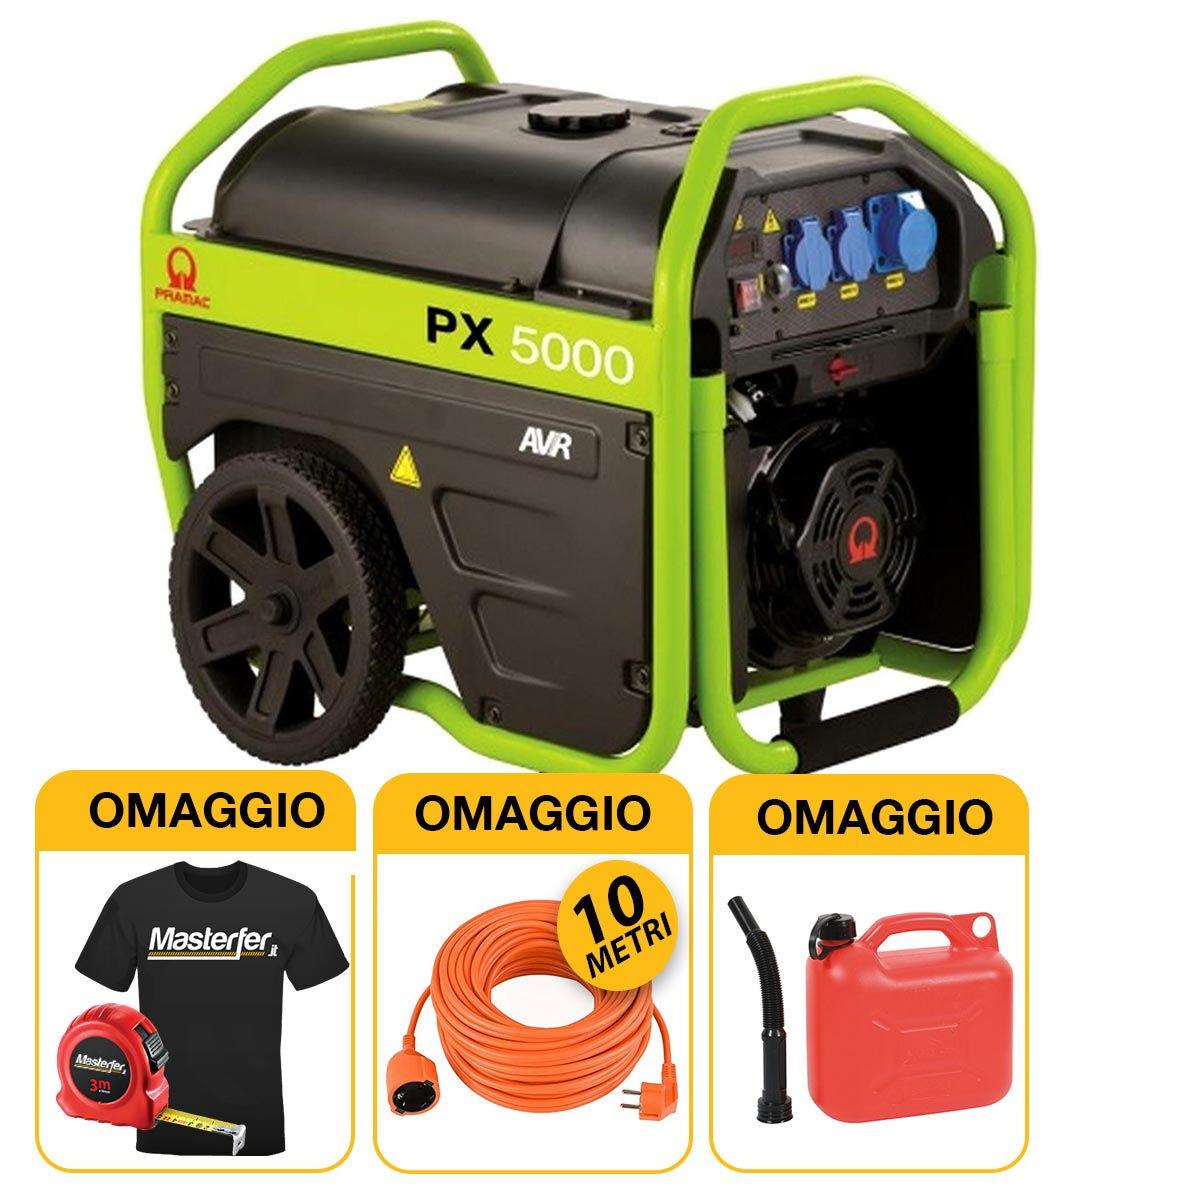 pramac px5000 - generatore di corrente professionale 3,6kw